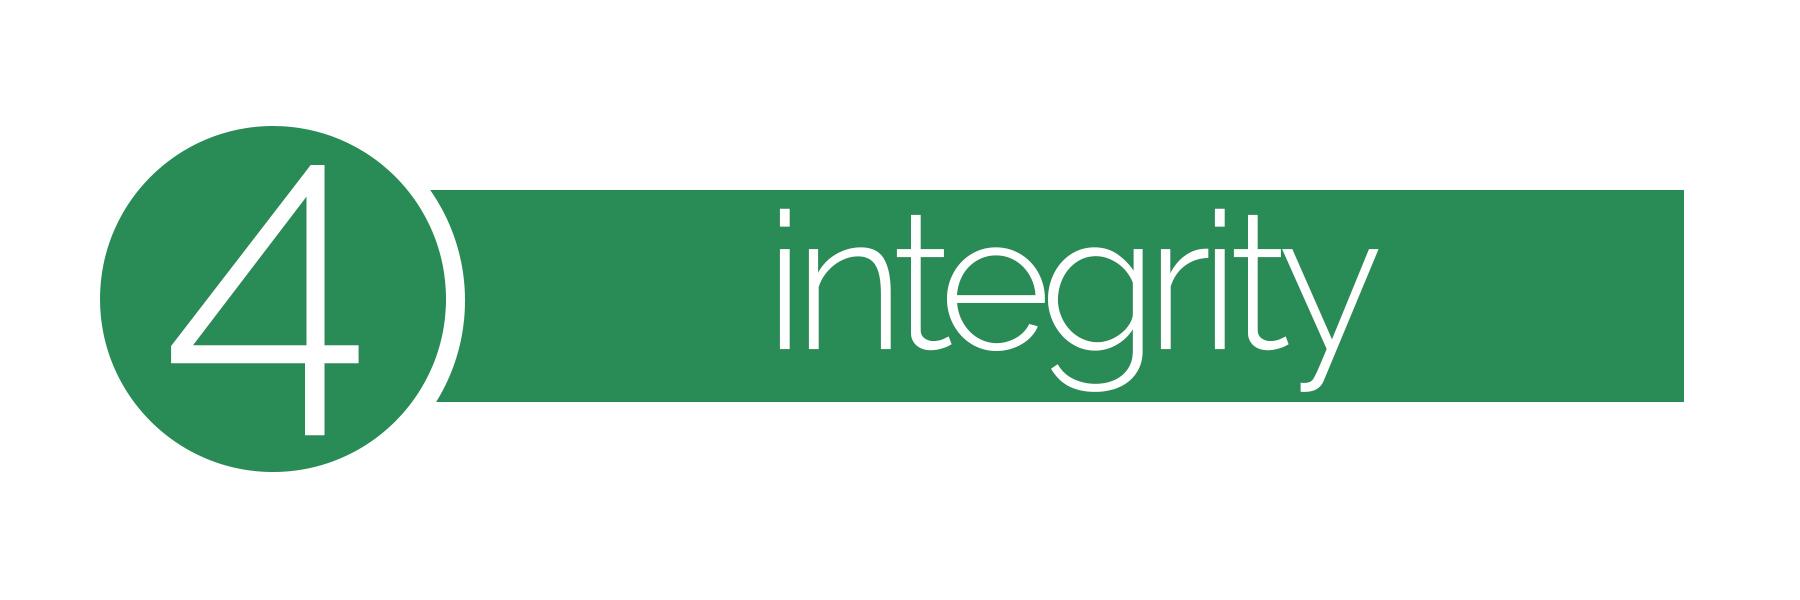 Core values #4 integrity